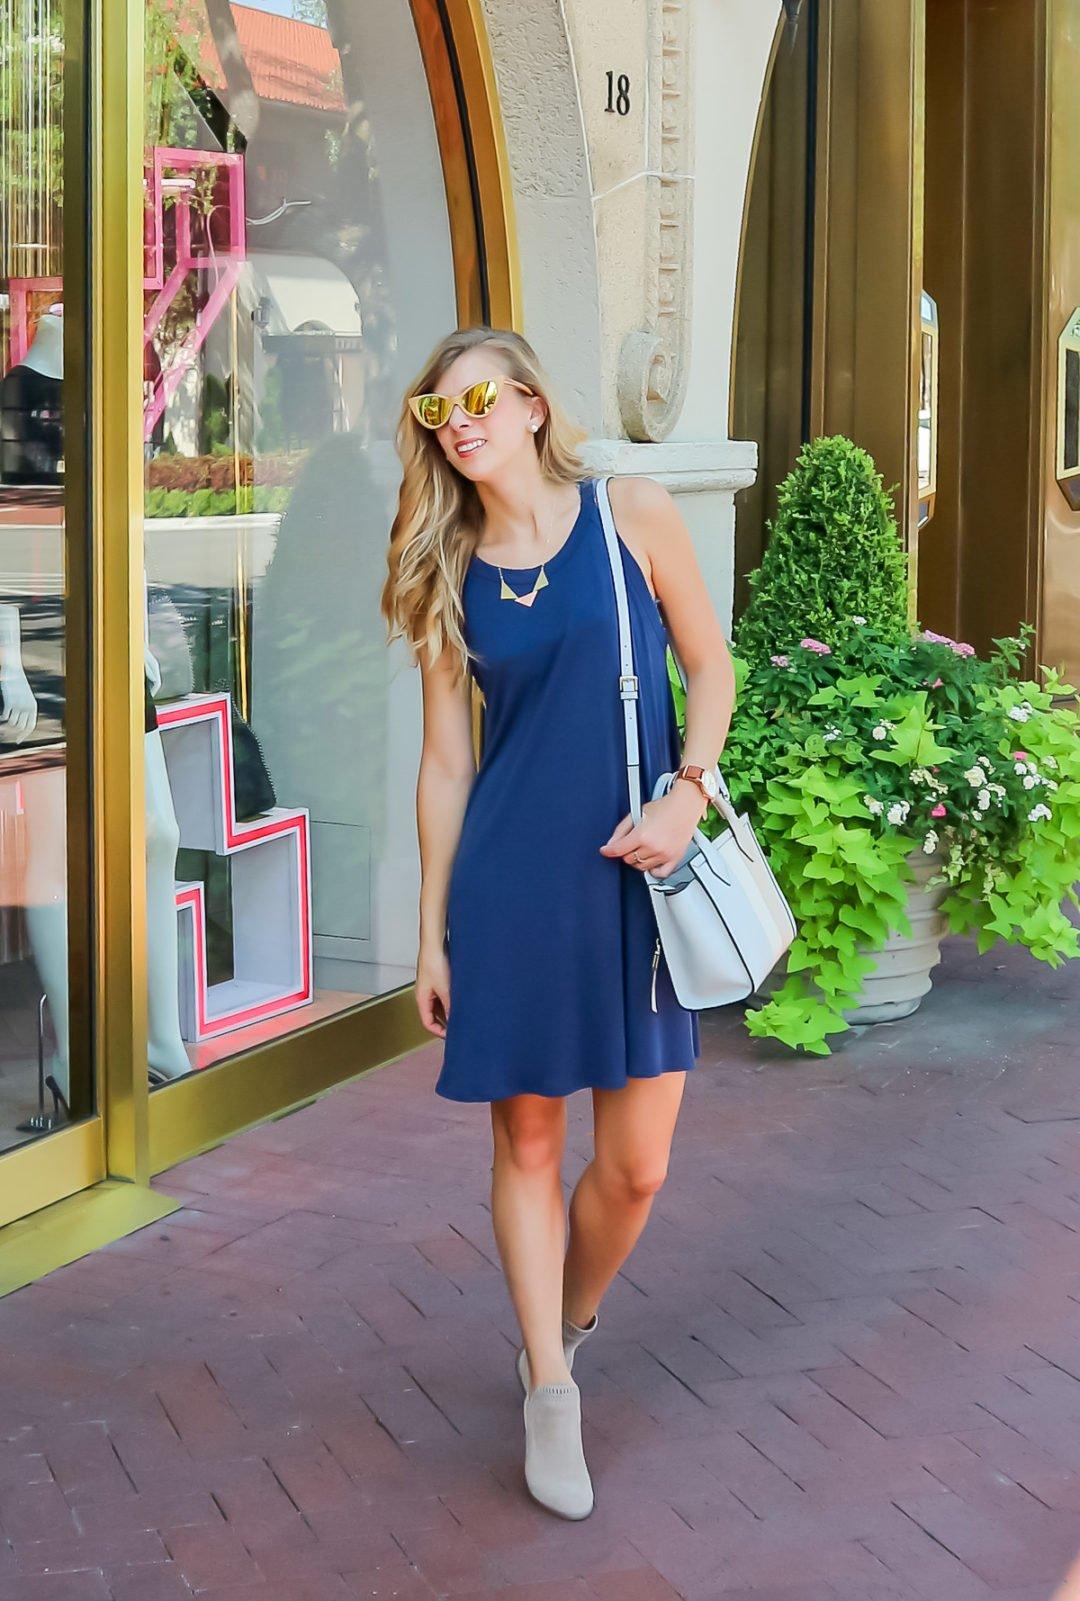 Zylina Wooden Sunglasses | Running in Heels